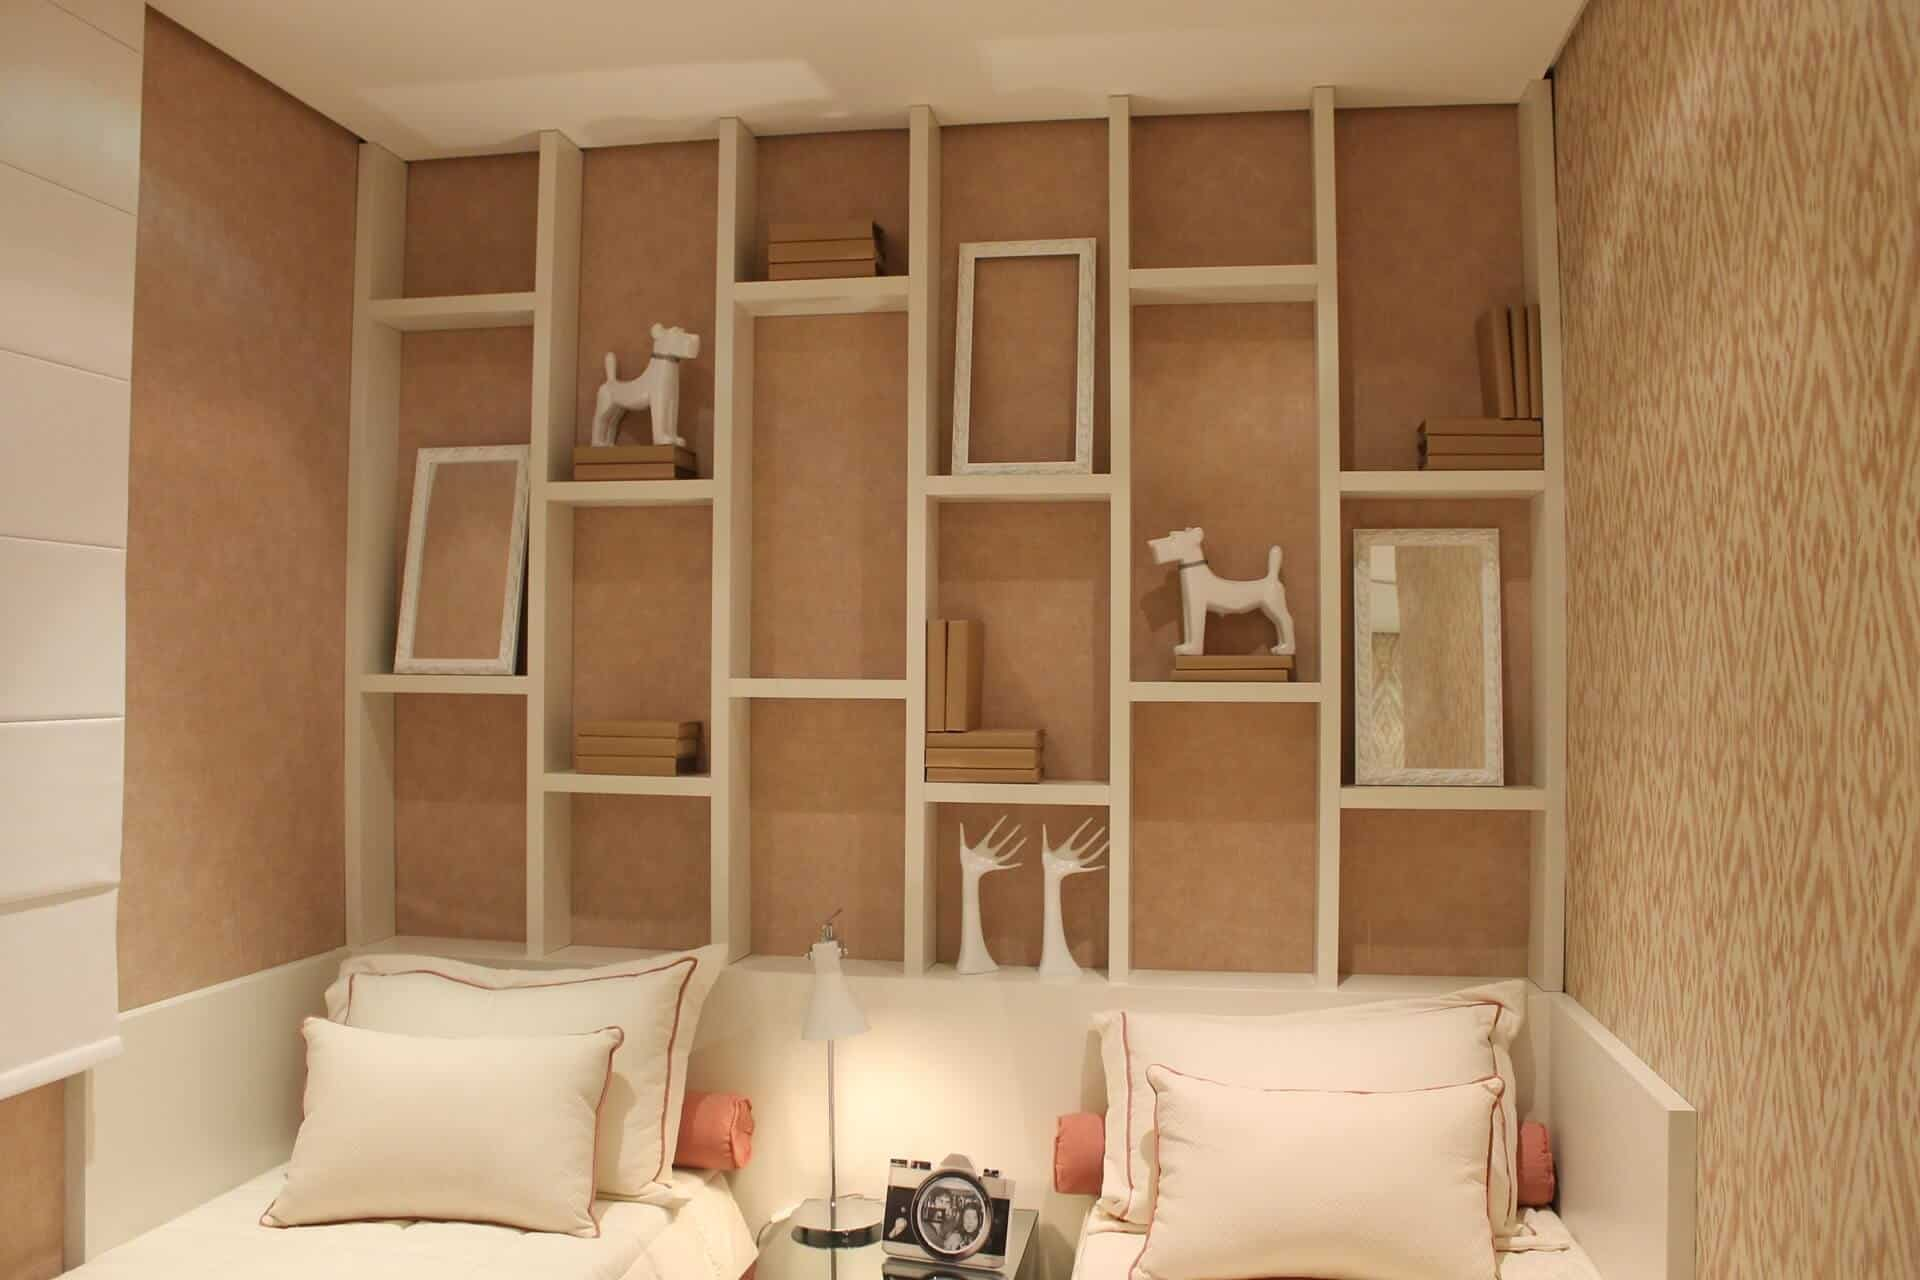 dormitorio-planejado_moveis-sob-medida-galeria-30